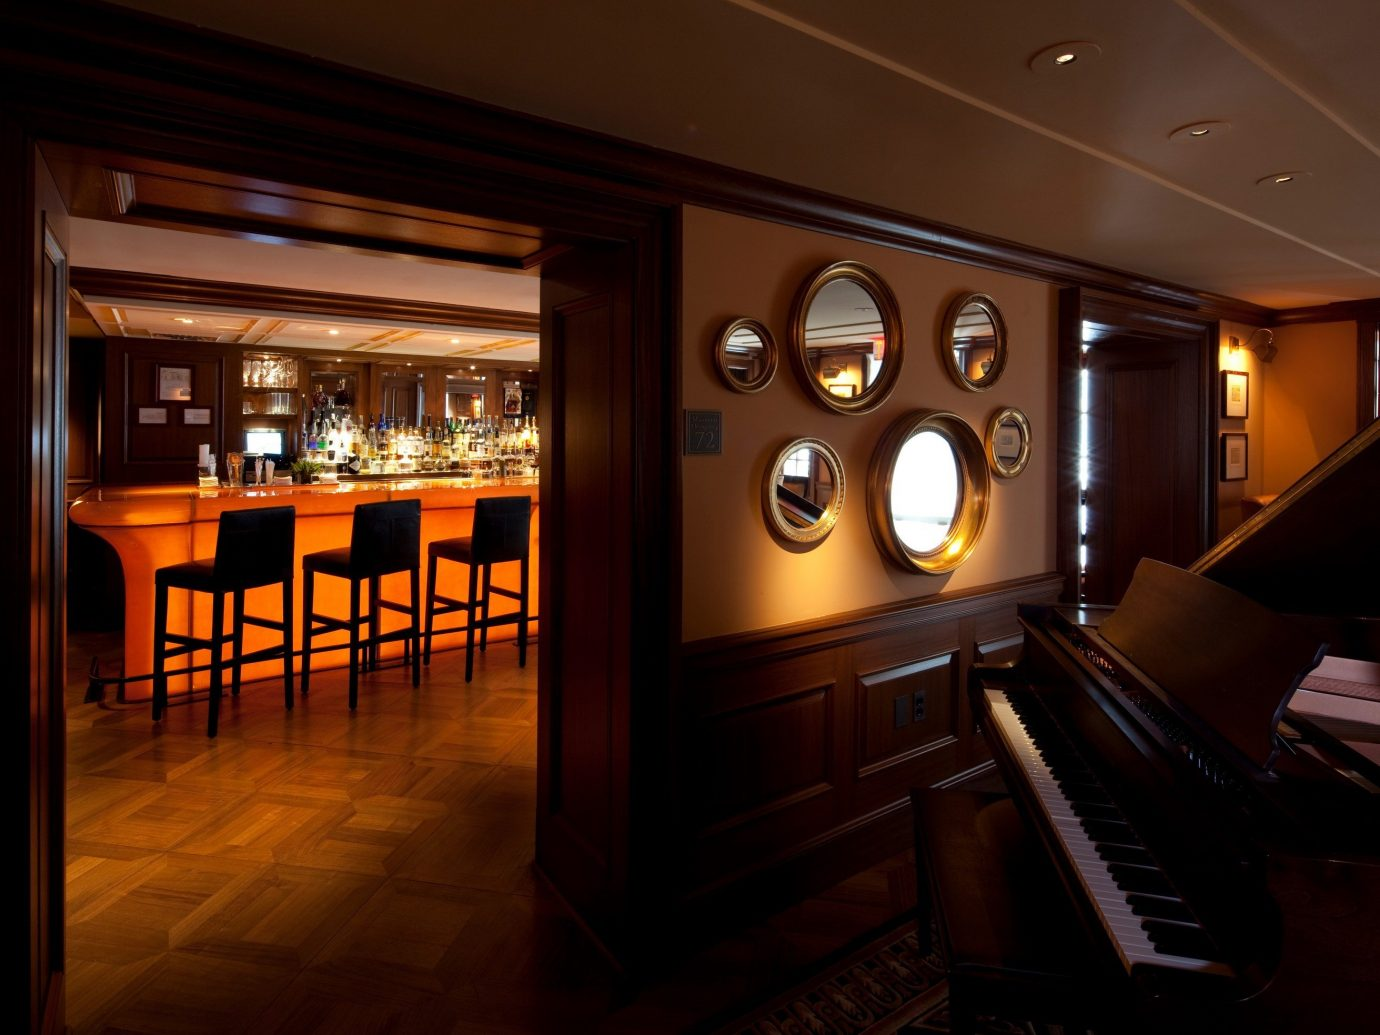 Food + Drink indoor floor ceiling recreation room Lobby estate interior design lighting Bar night basement